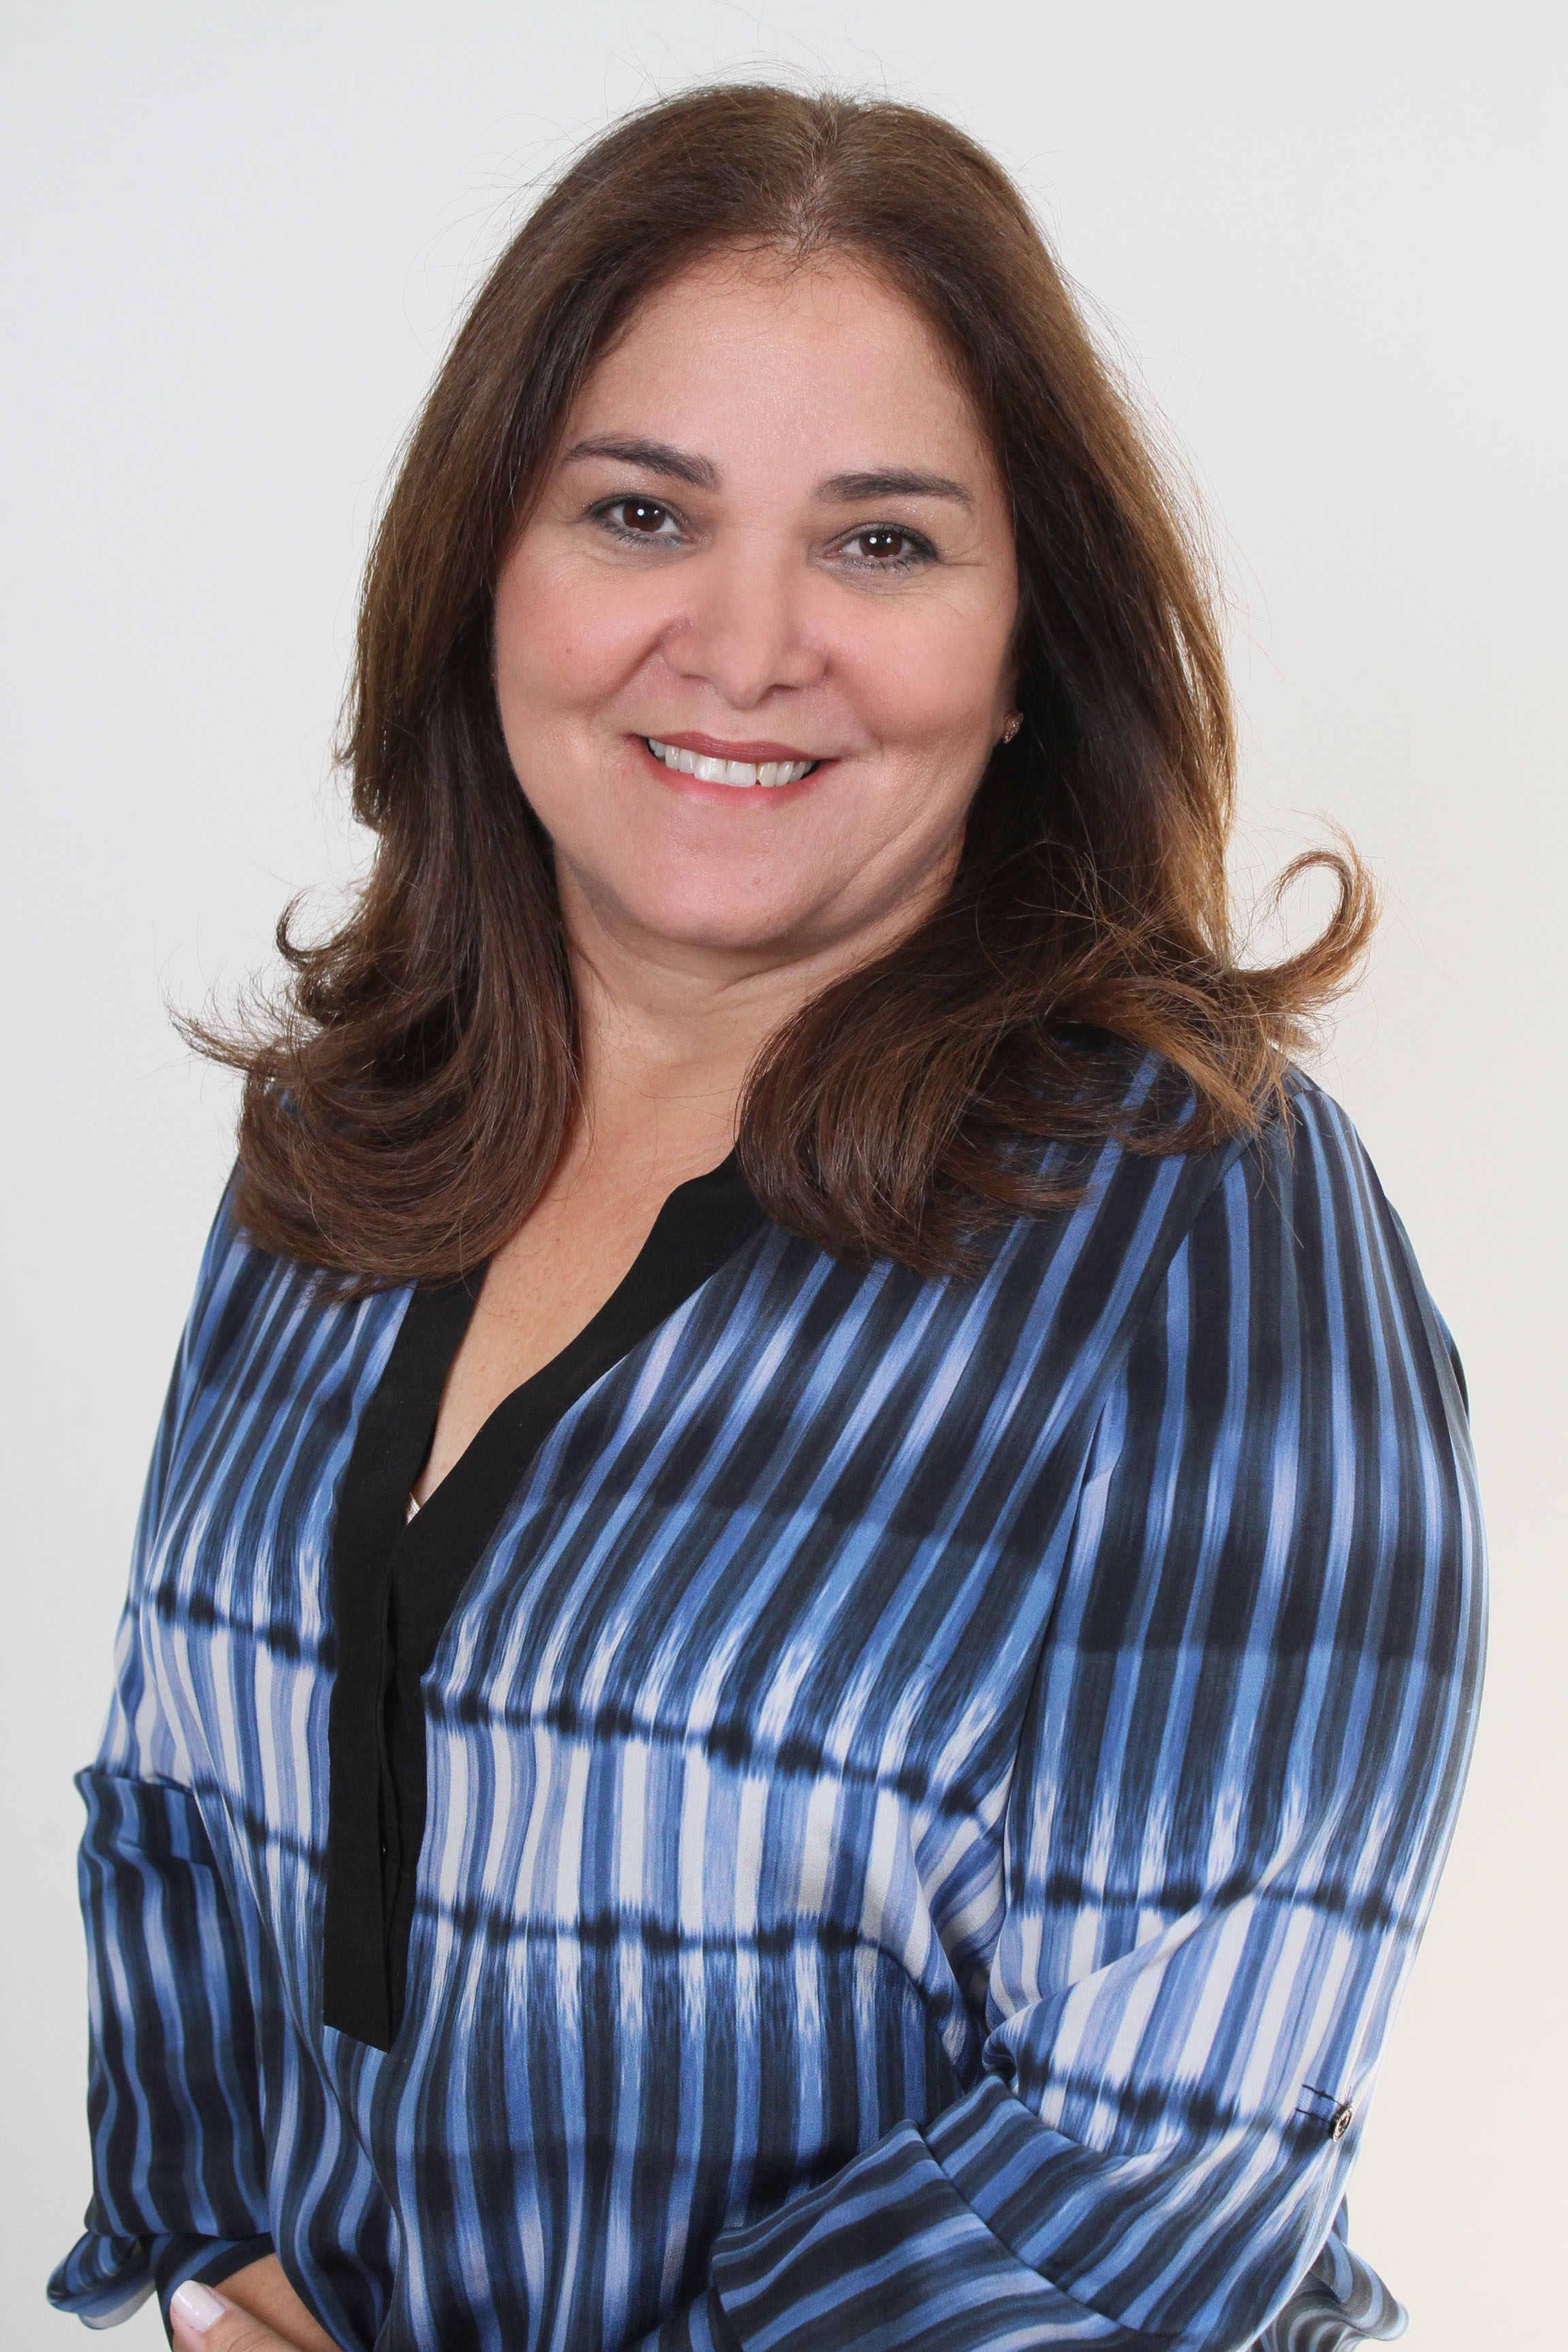 Grace Cochón de Solares, MBA,, Vicerrectora Administrativa